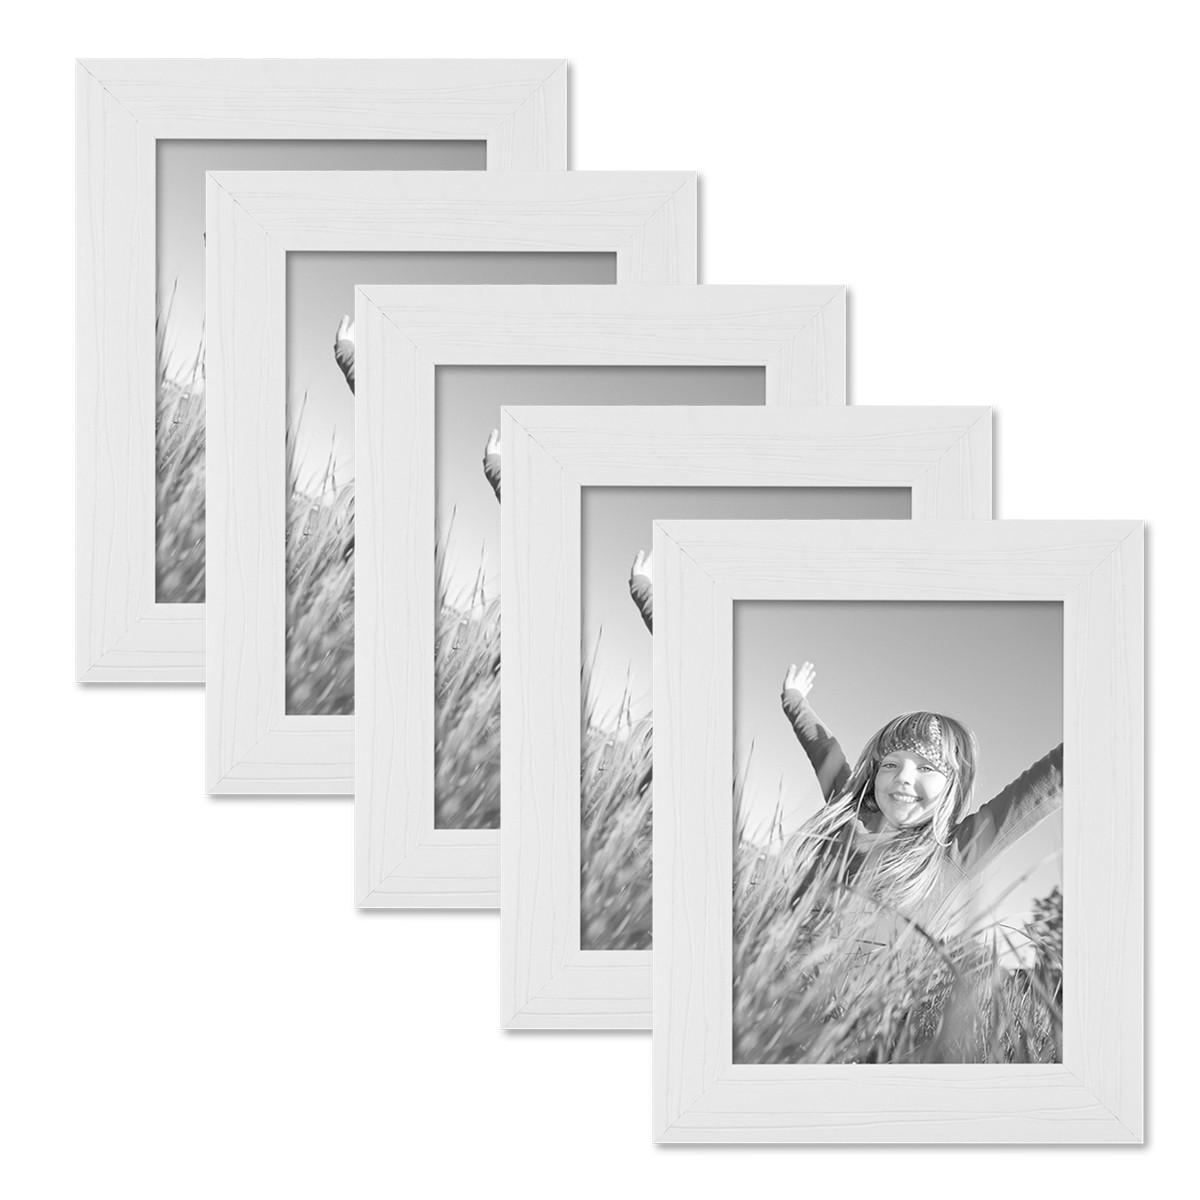 5er Set Bilderrahmen 13x18 cm Weiss Modern Massivholz-Rahmen mit ...